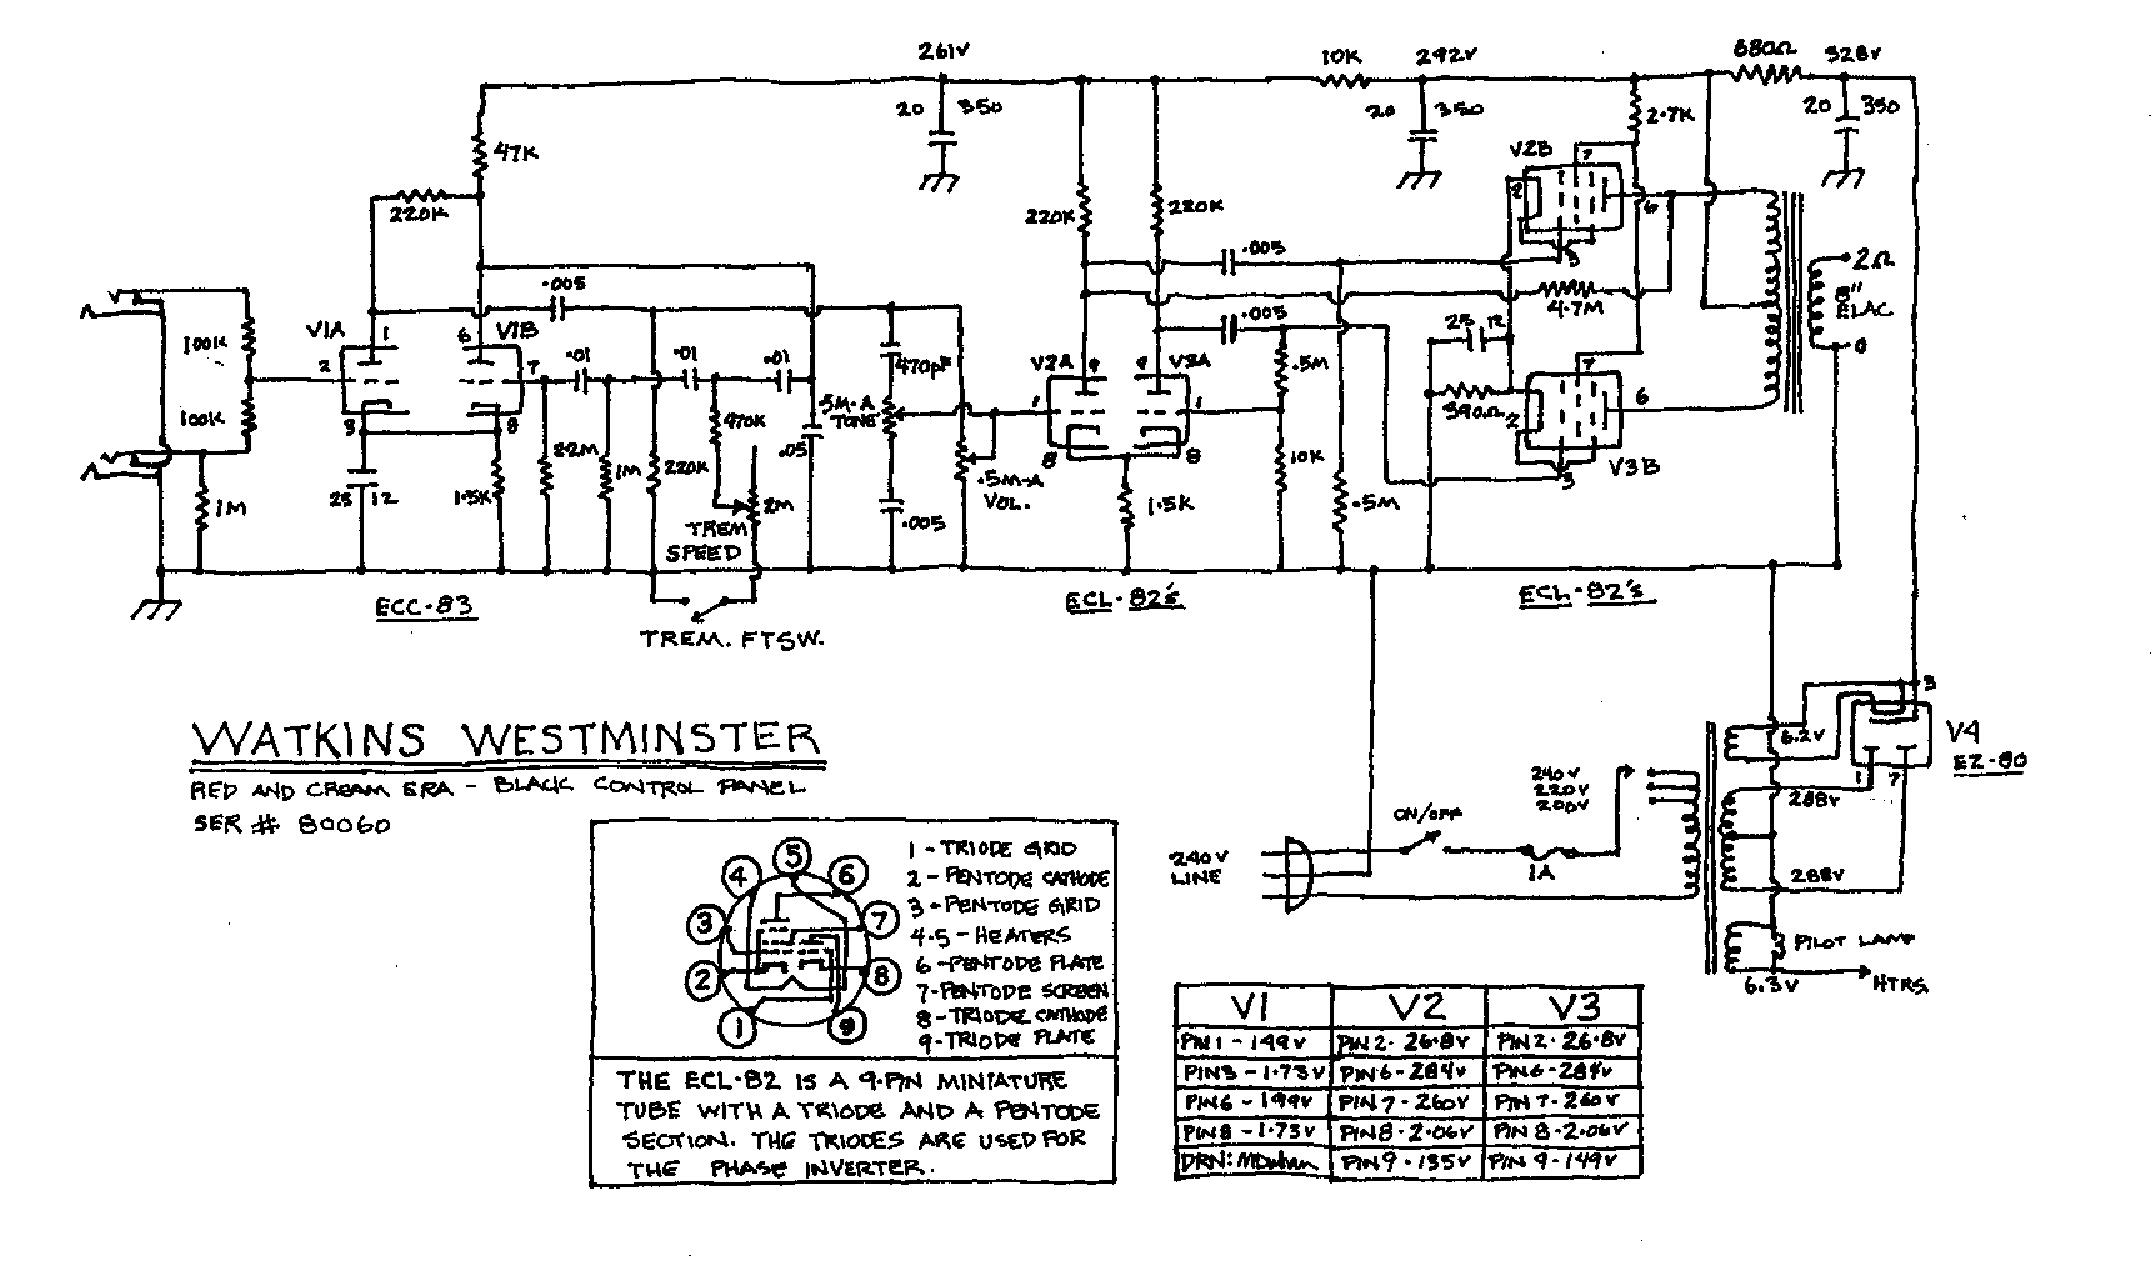 watkins copicat mkiv sch service manual download, schematics, eeprom Series and Parallel Circuits Diagrams watkins westminster